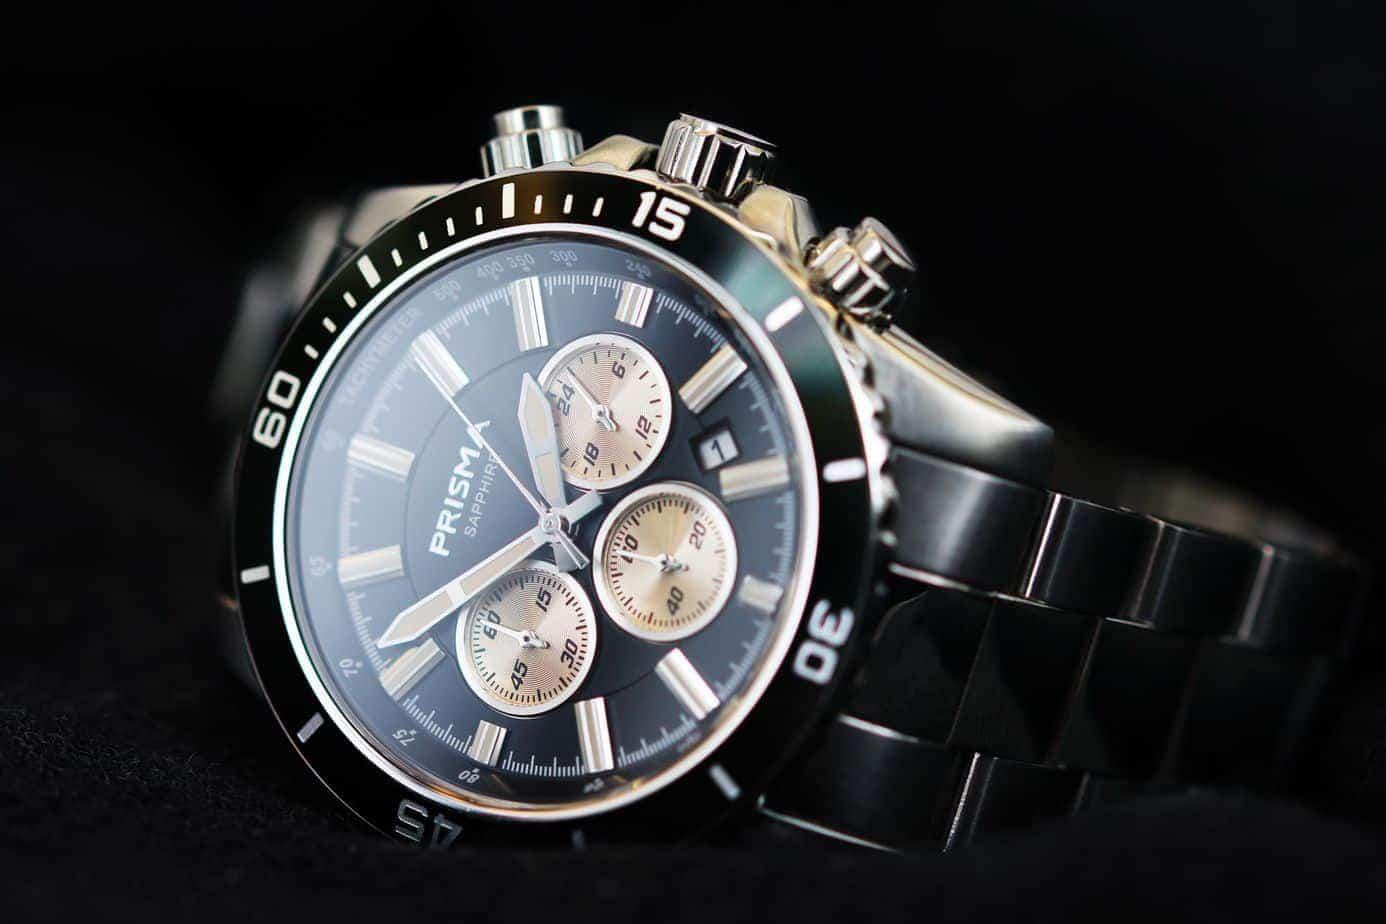 chronograaf horloge chronograph watches prisma horloges explorer navigator zwart watches black